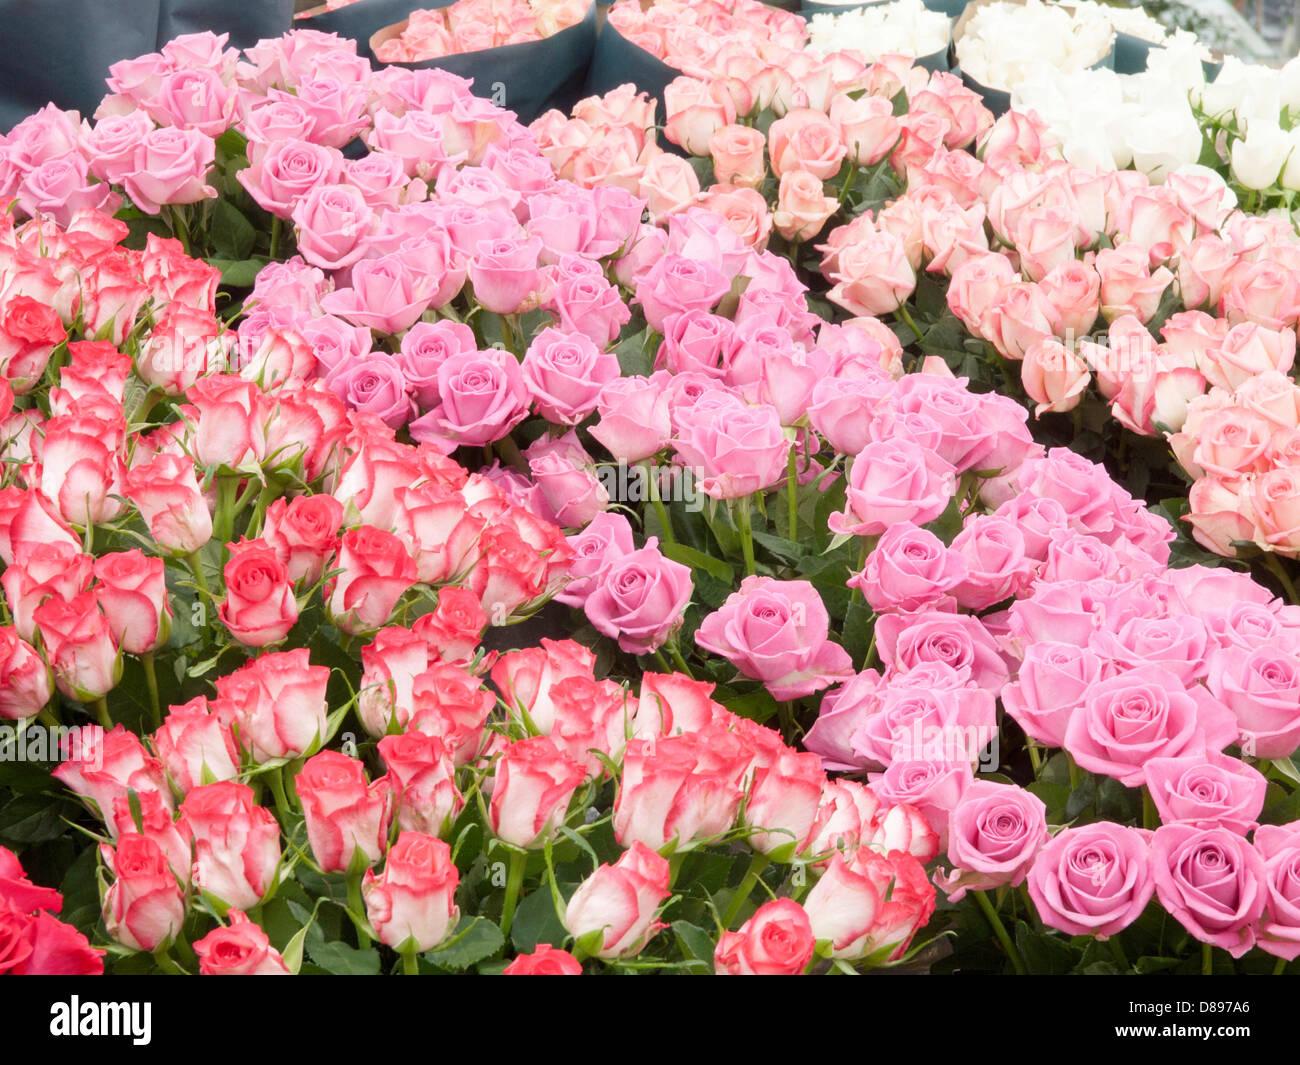 Spencer house london stock photos spencer house london stock roses from kenya just for marks and spencer izmirmasajfo